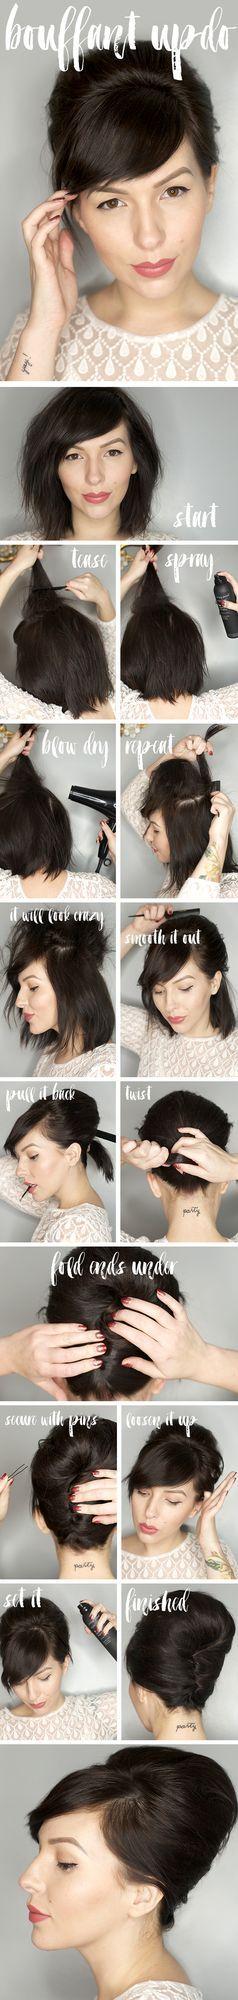 Bouffant Updo Hair Tutorial | keiko lynn | Bloglovin'